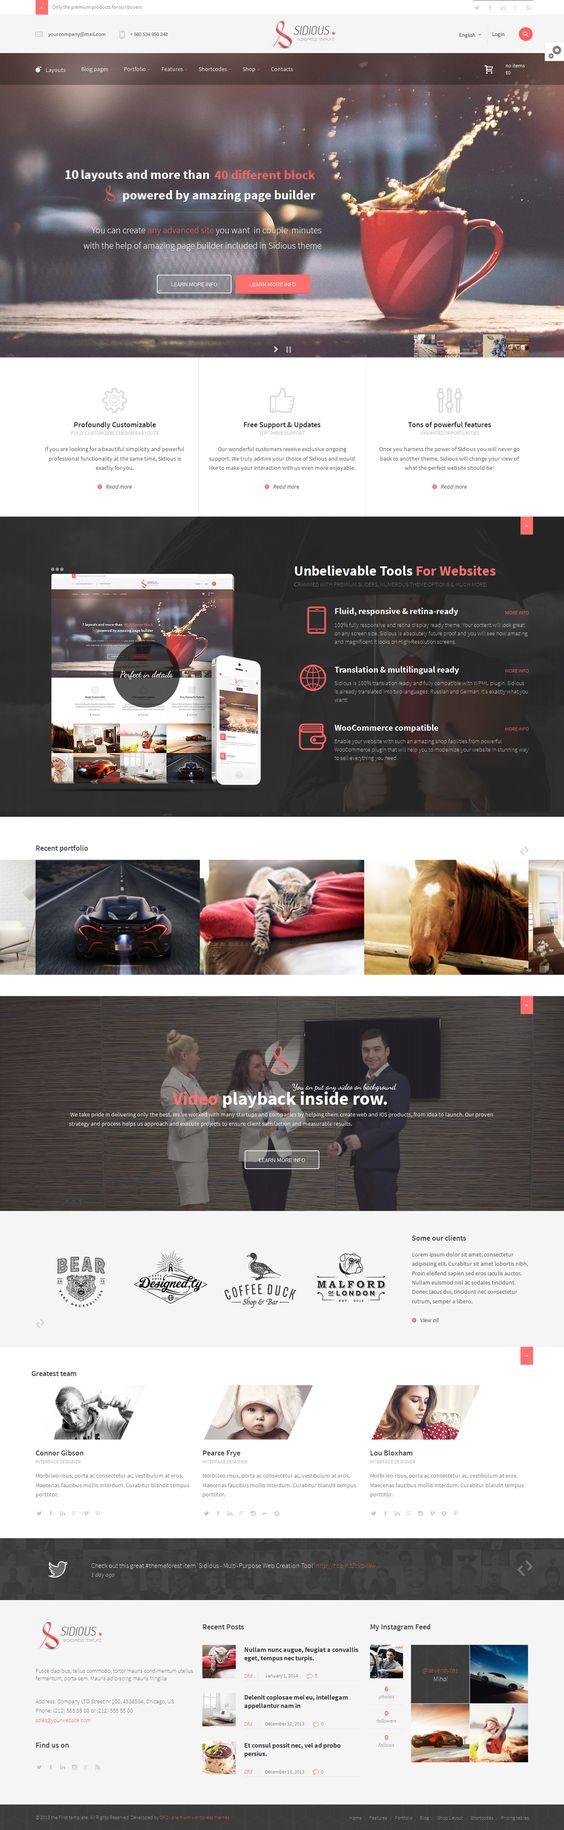 Sidious - Multi-Purpose Web Creation Tool http://themeforest.net/item/sidious-multipurpose-web-creation-tool/6526949?ref=wpaw #web #creative #design